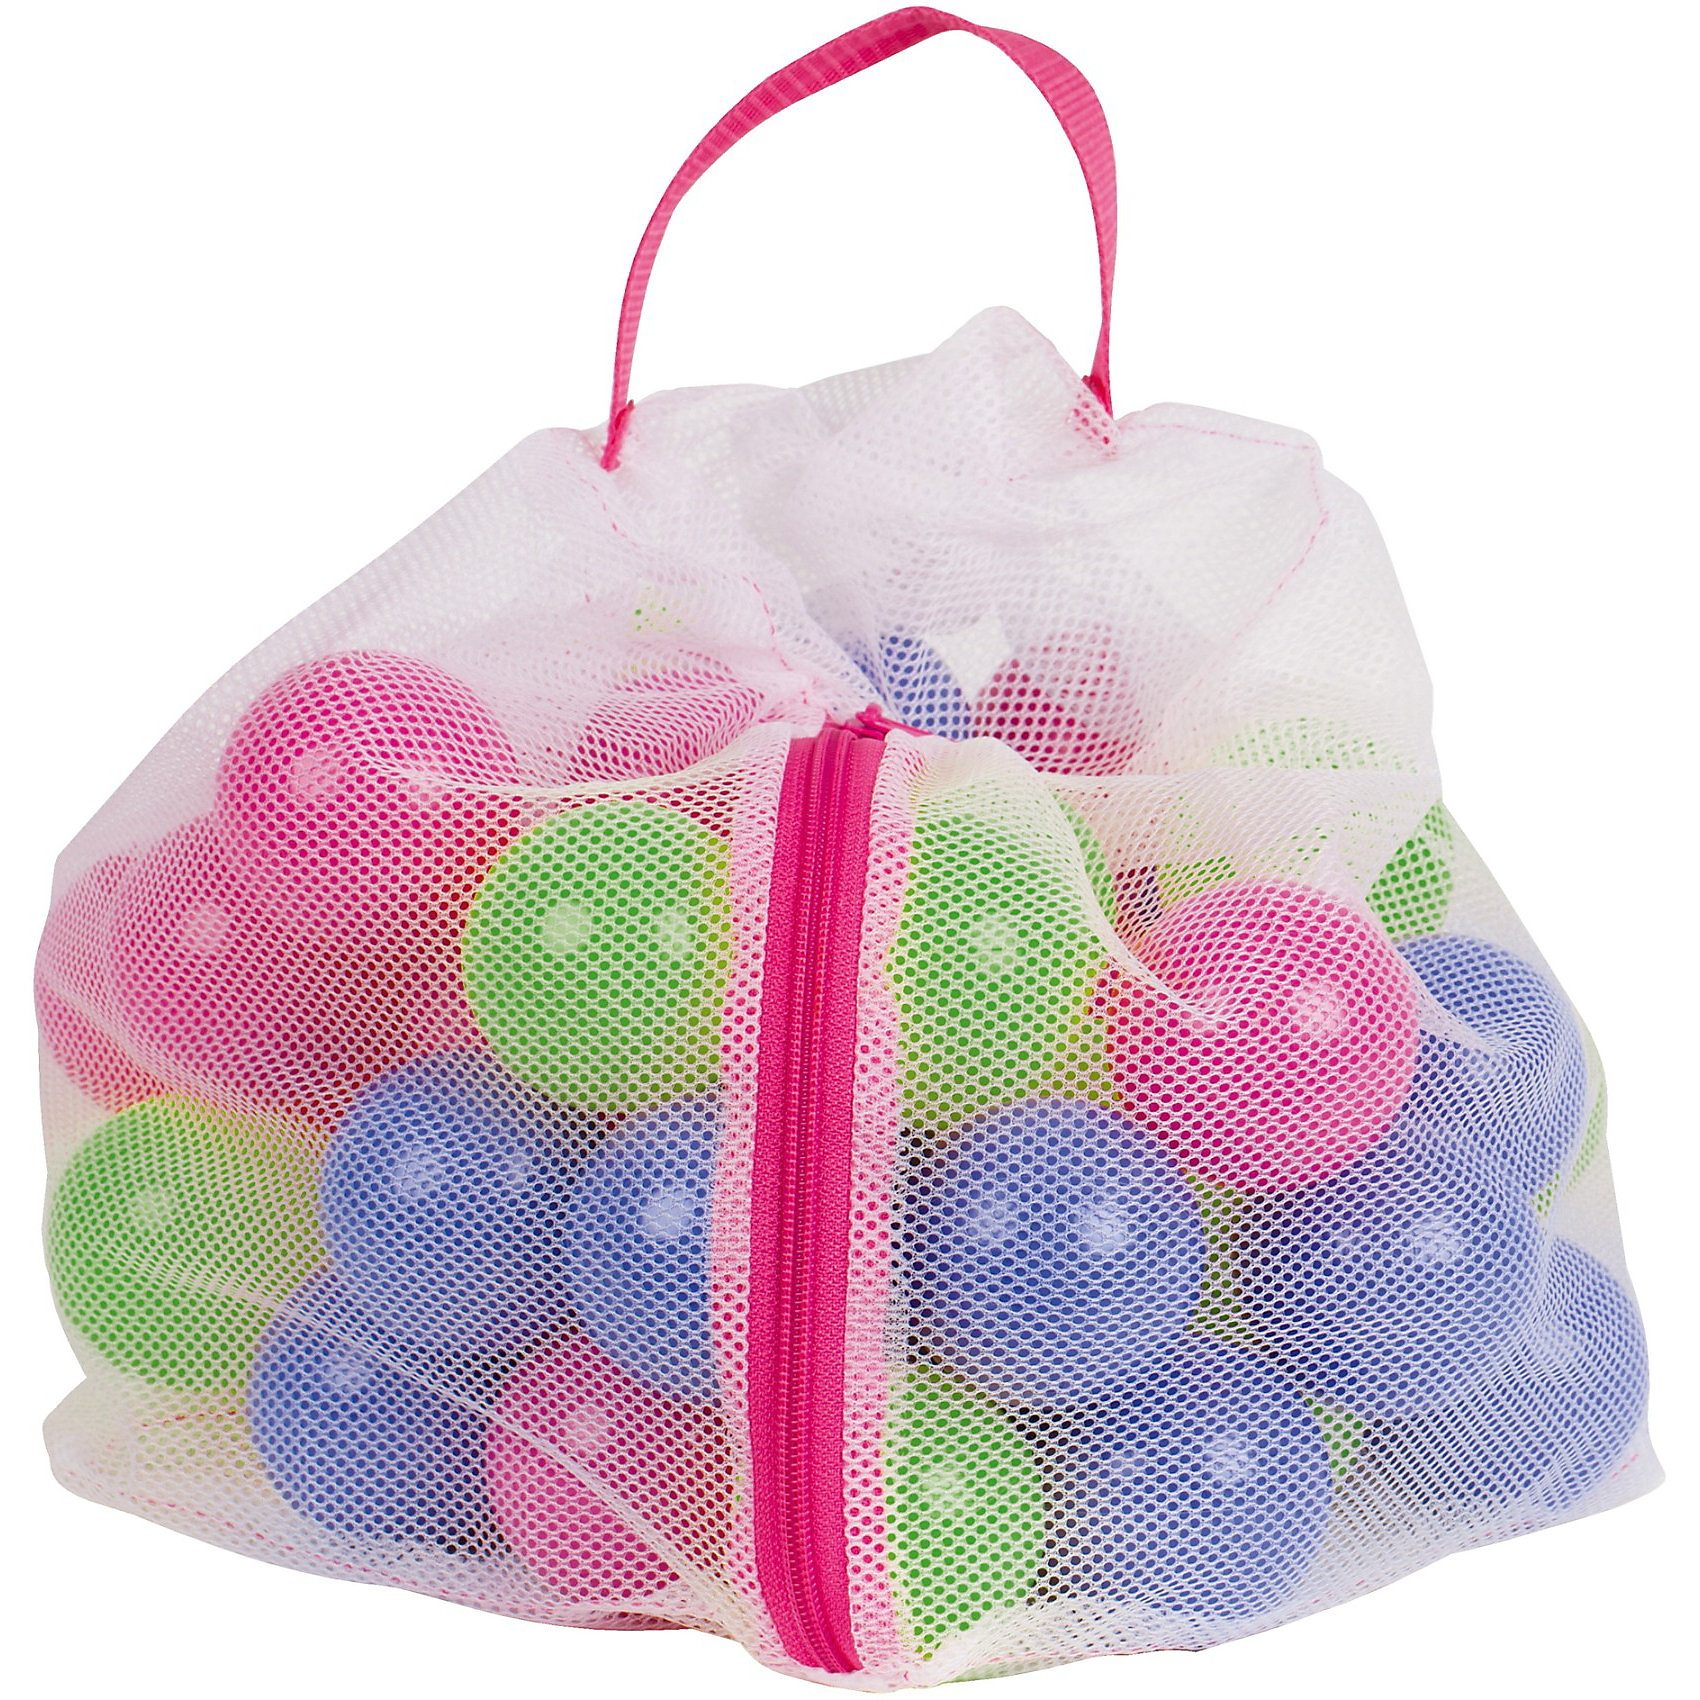 JOHN PE-Bälle 50-tlg. pink/grün/blau